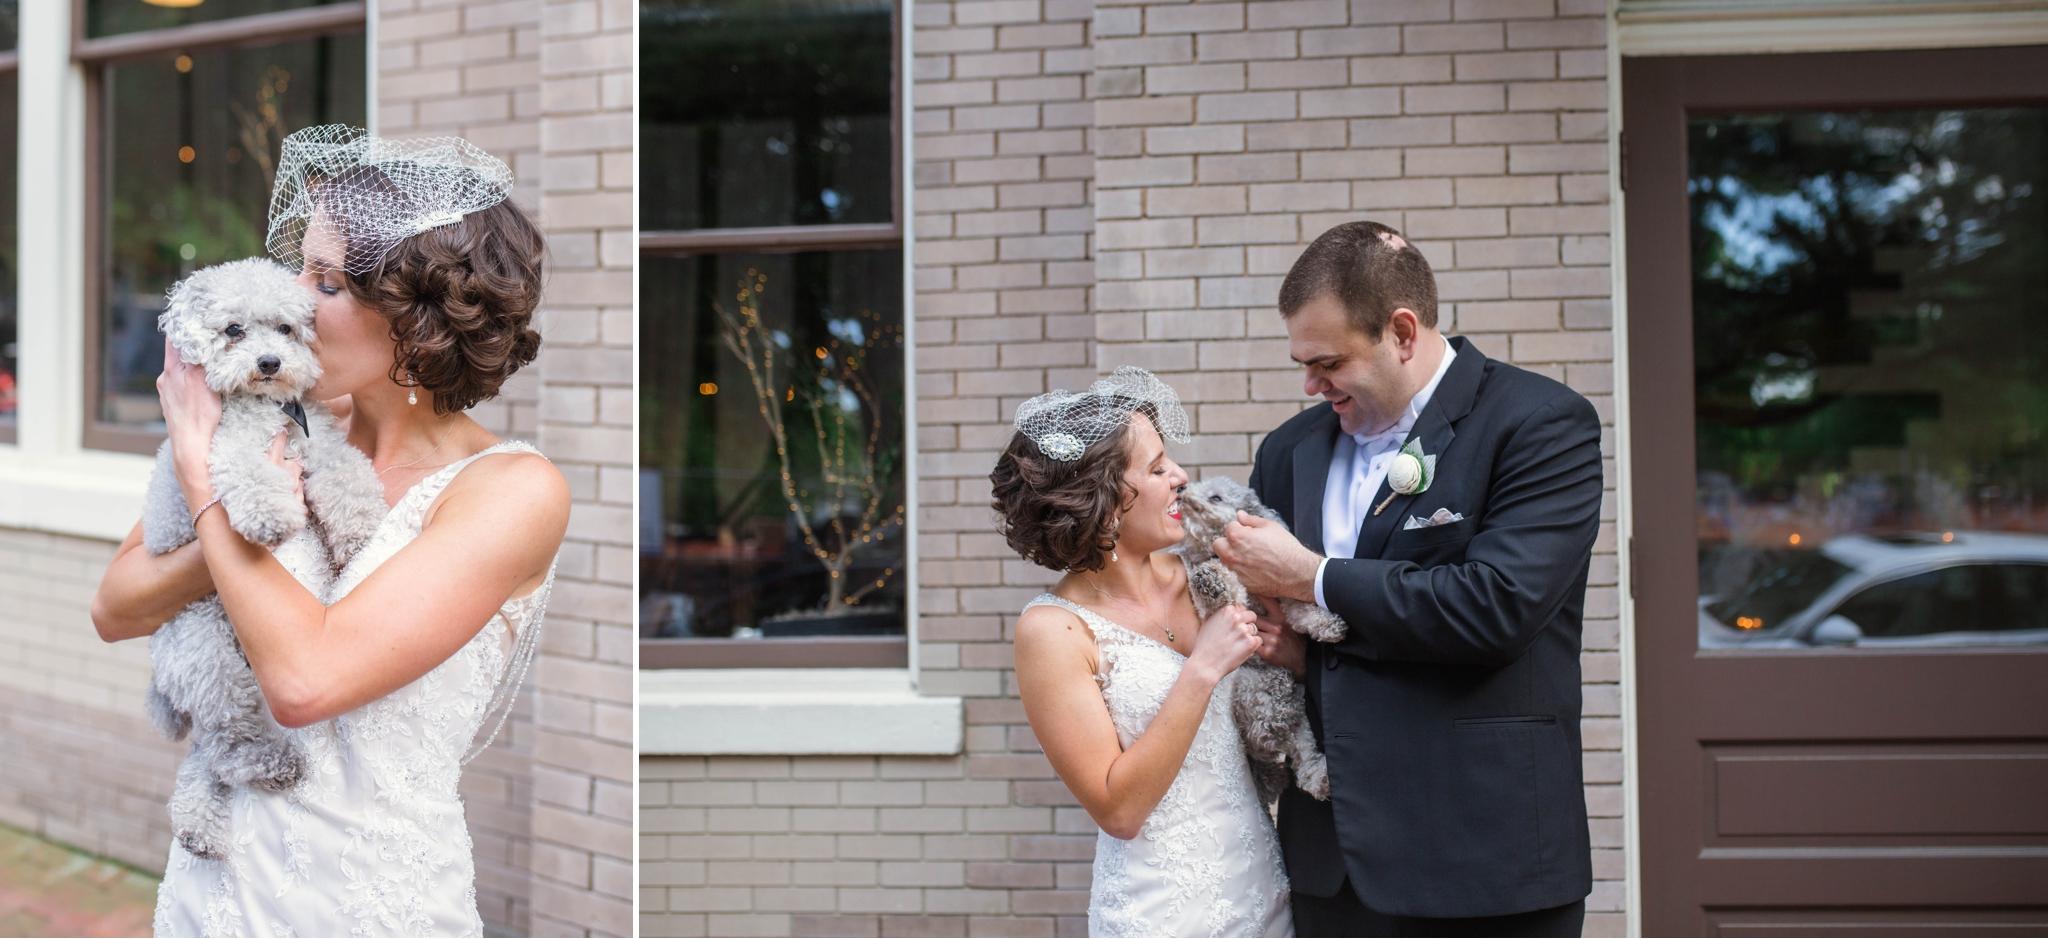 Dani + Adam - Wedding at 214 Martin Street - Raleigh North Carolina Photographer